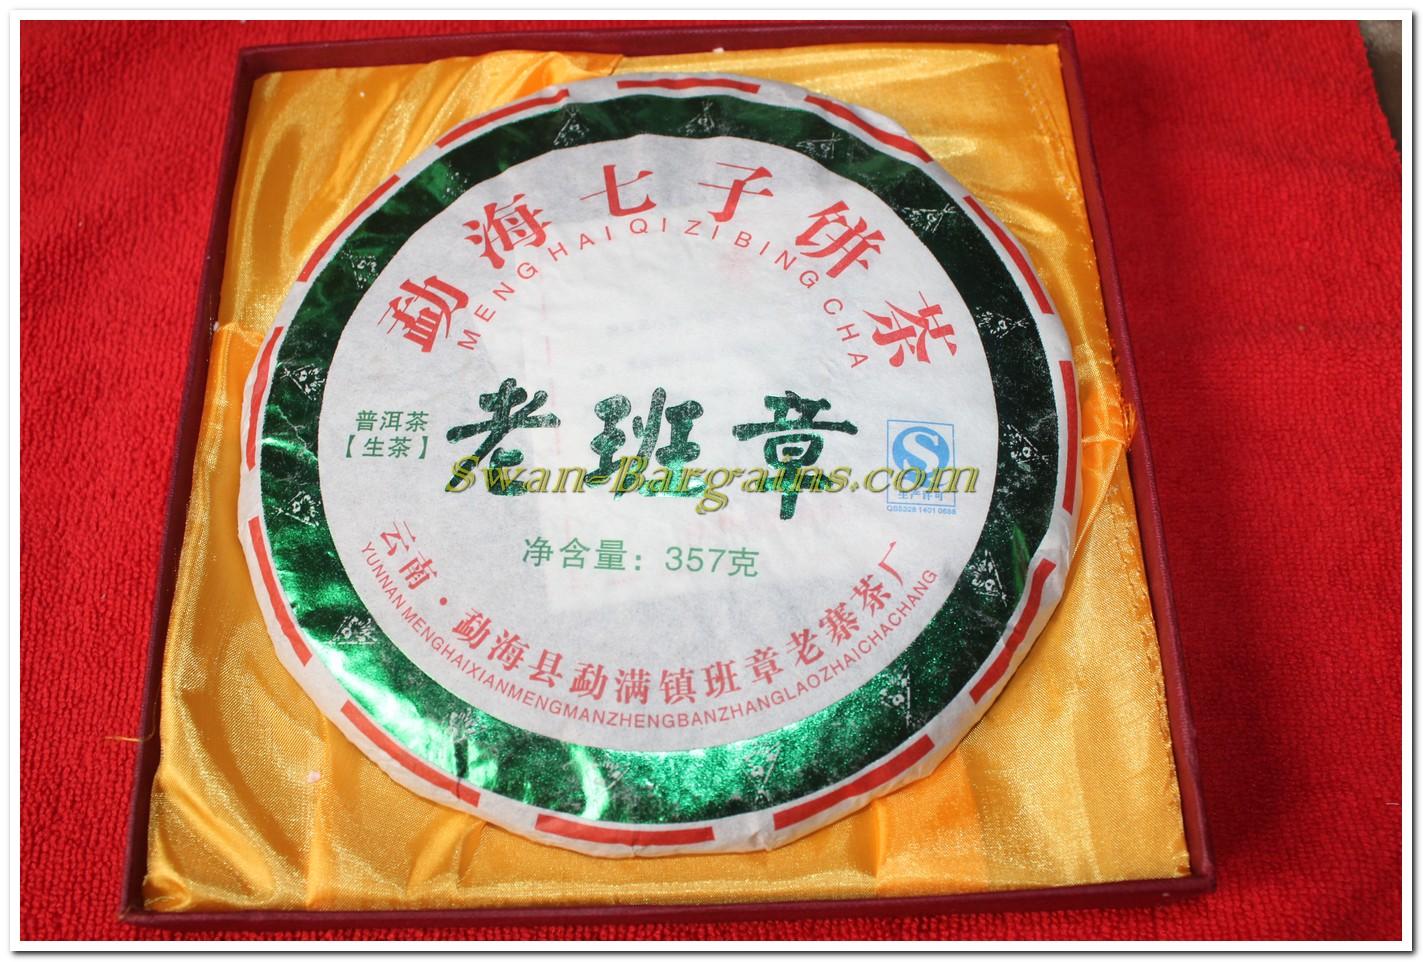 Yunnan 2010 Lao Ban Zhang Raw Puer Tea Cake 357g Chinese